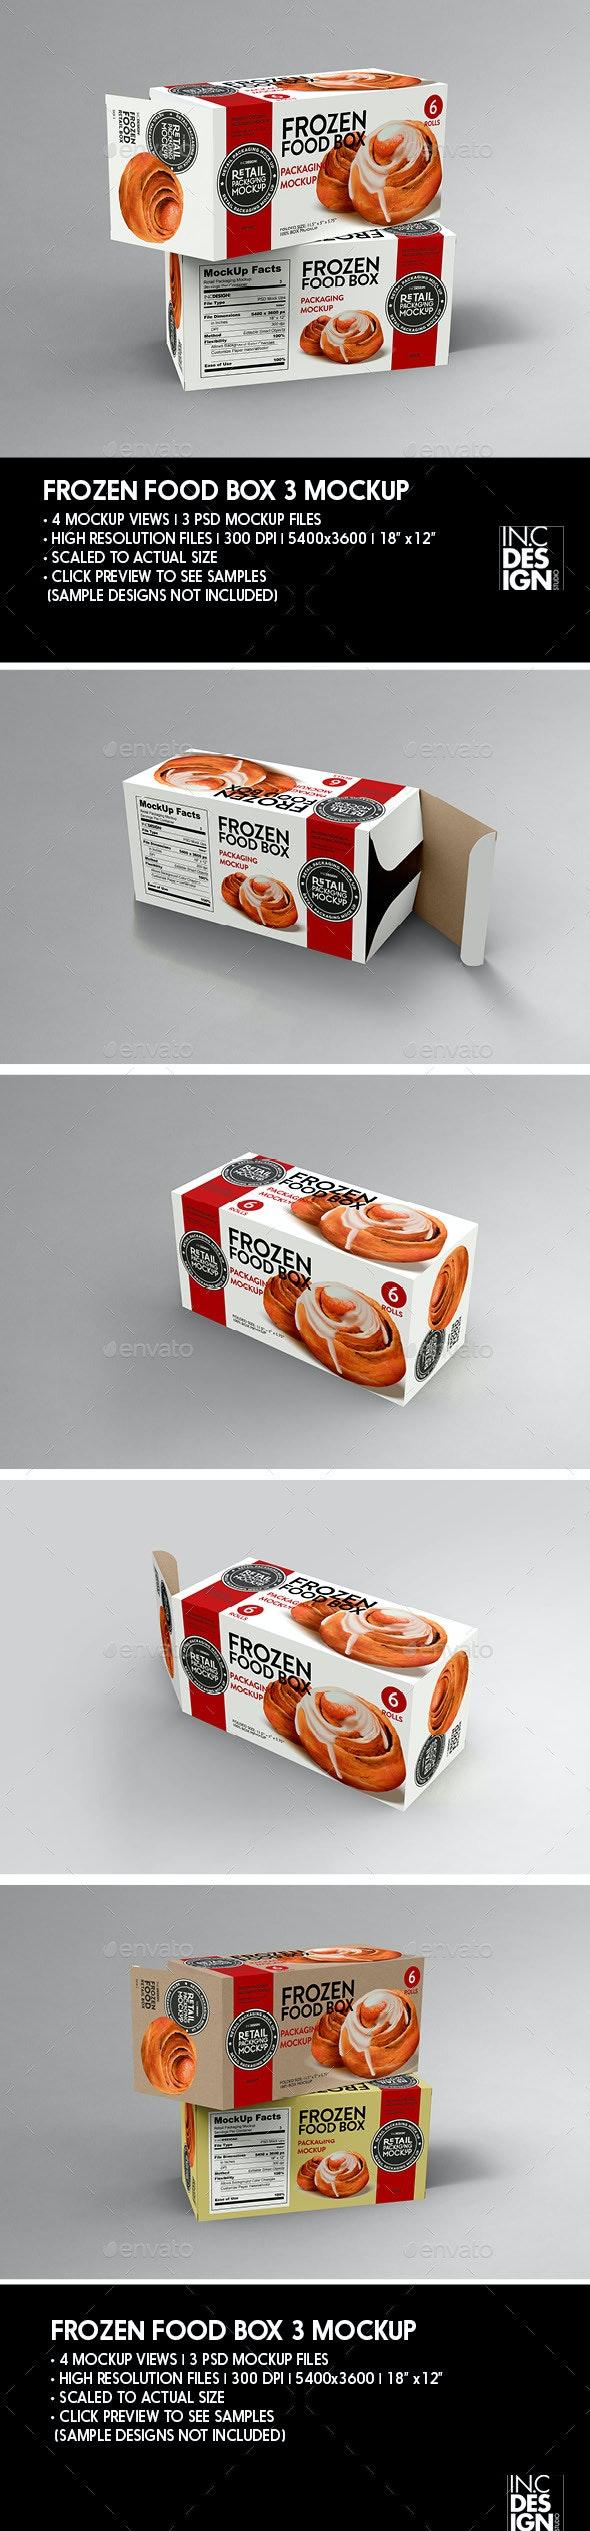 Retail Frozen Long Food Box Packaging Mockup - Packaging Product Mock-Ups